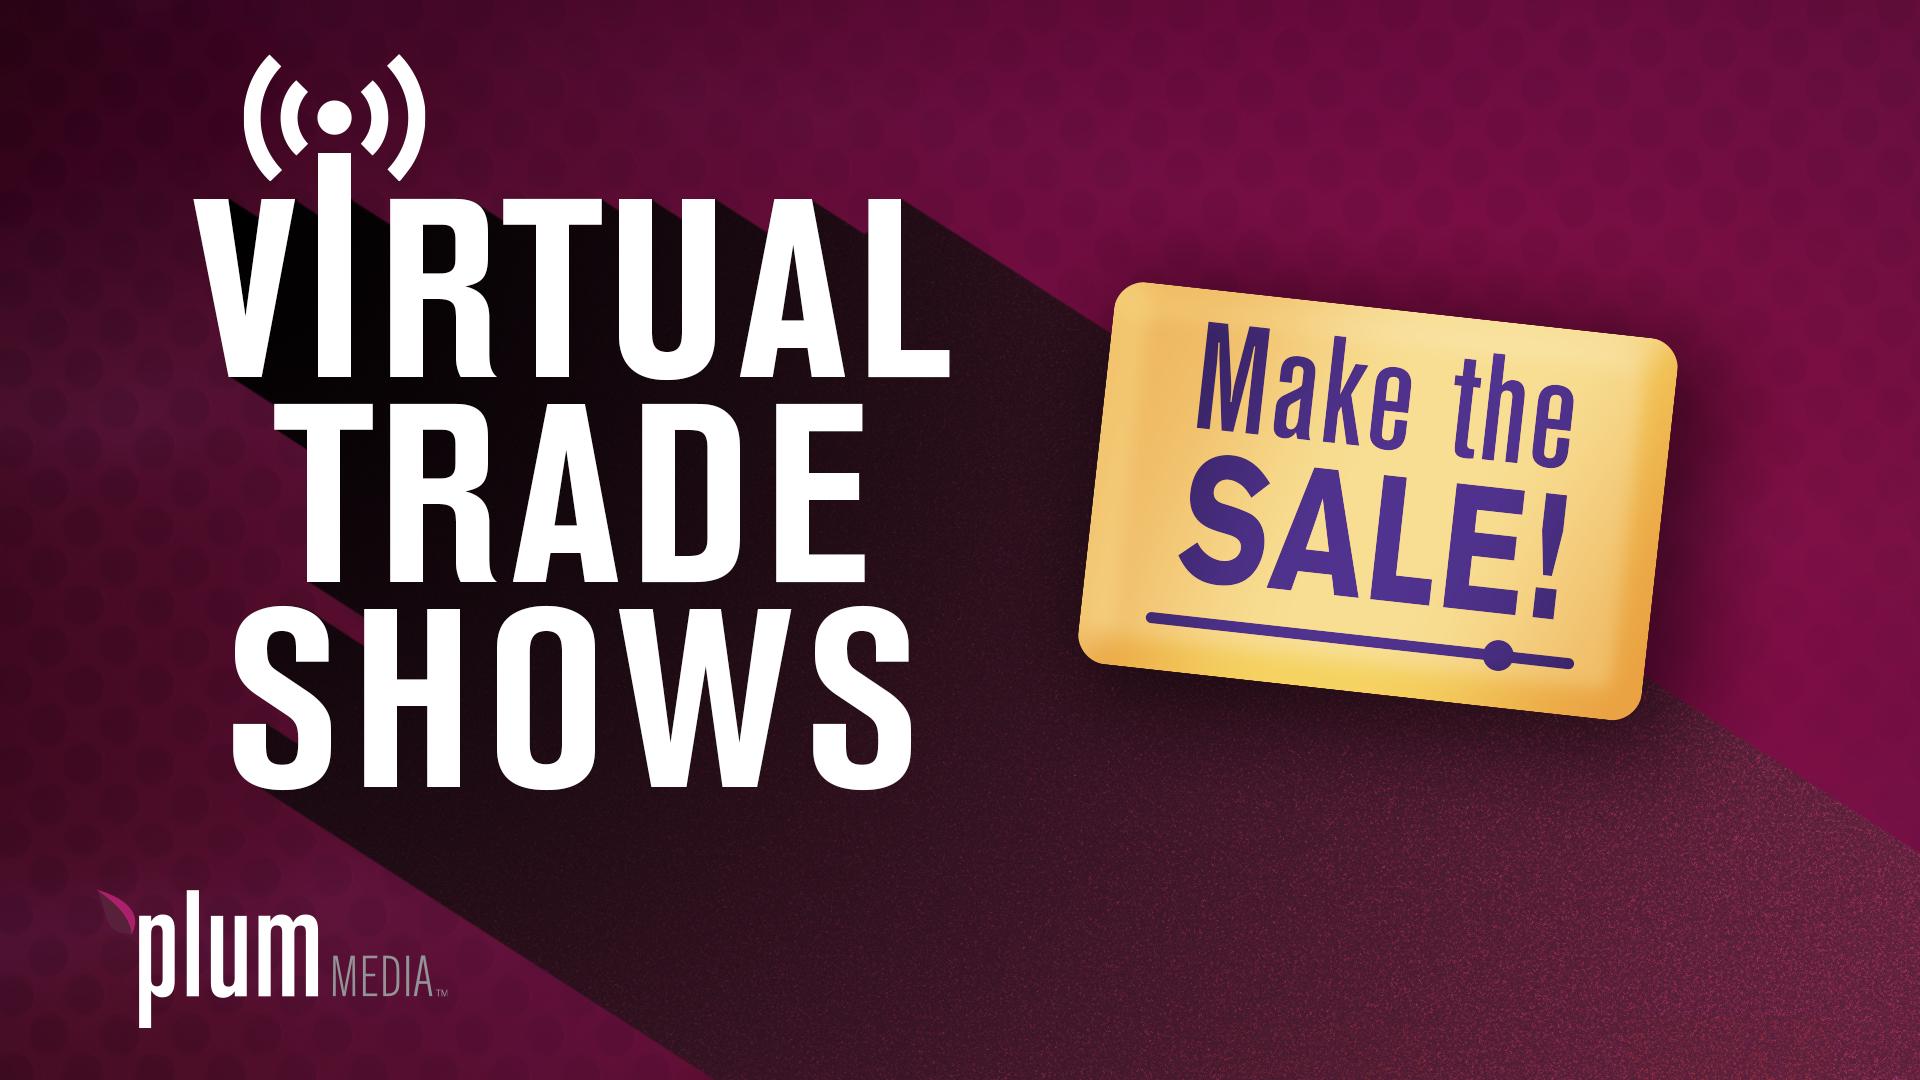 4771_Virtual Trade Shows_v3